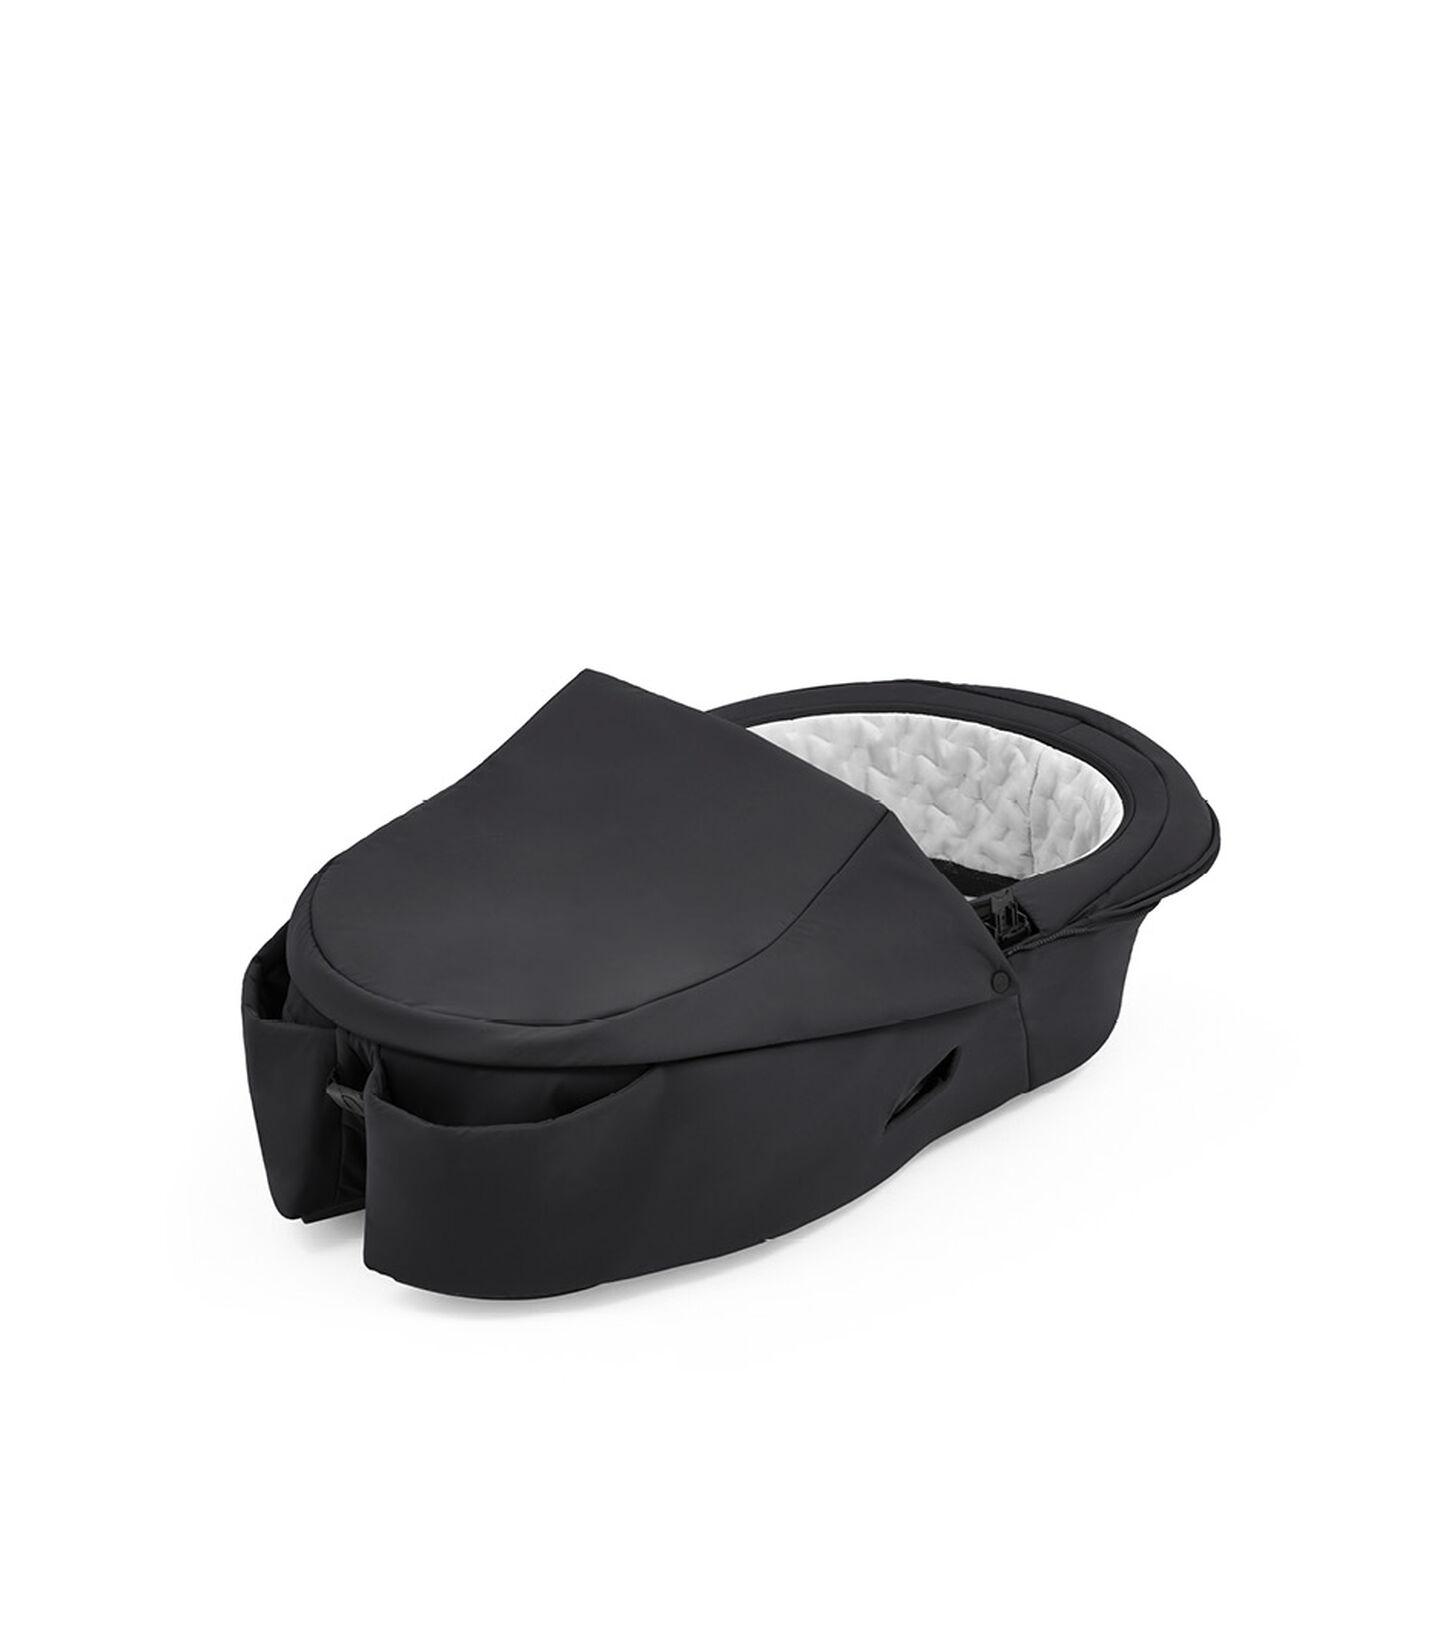 Люлька-переноска к коляске Stokke® Xplory® Насыщенный черный, Насыщенный черный, mainview view 2